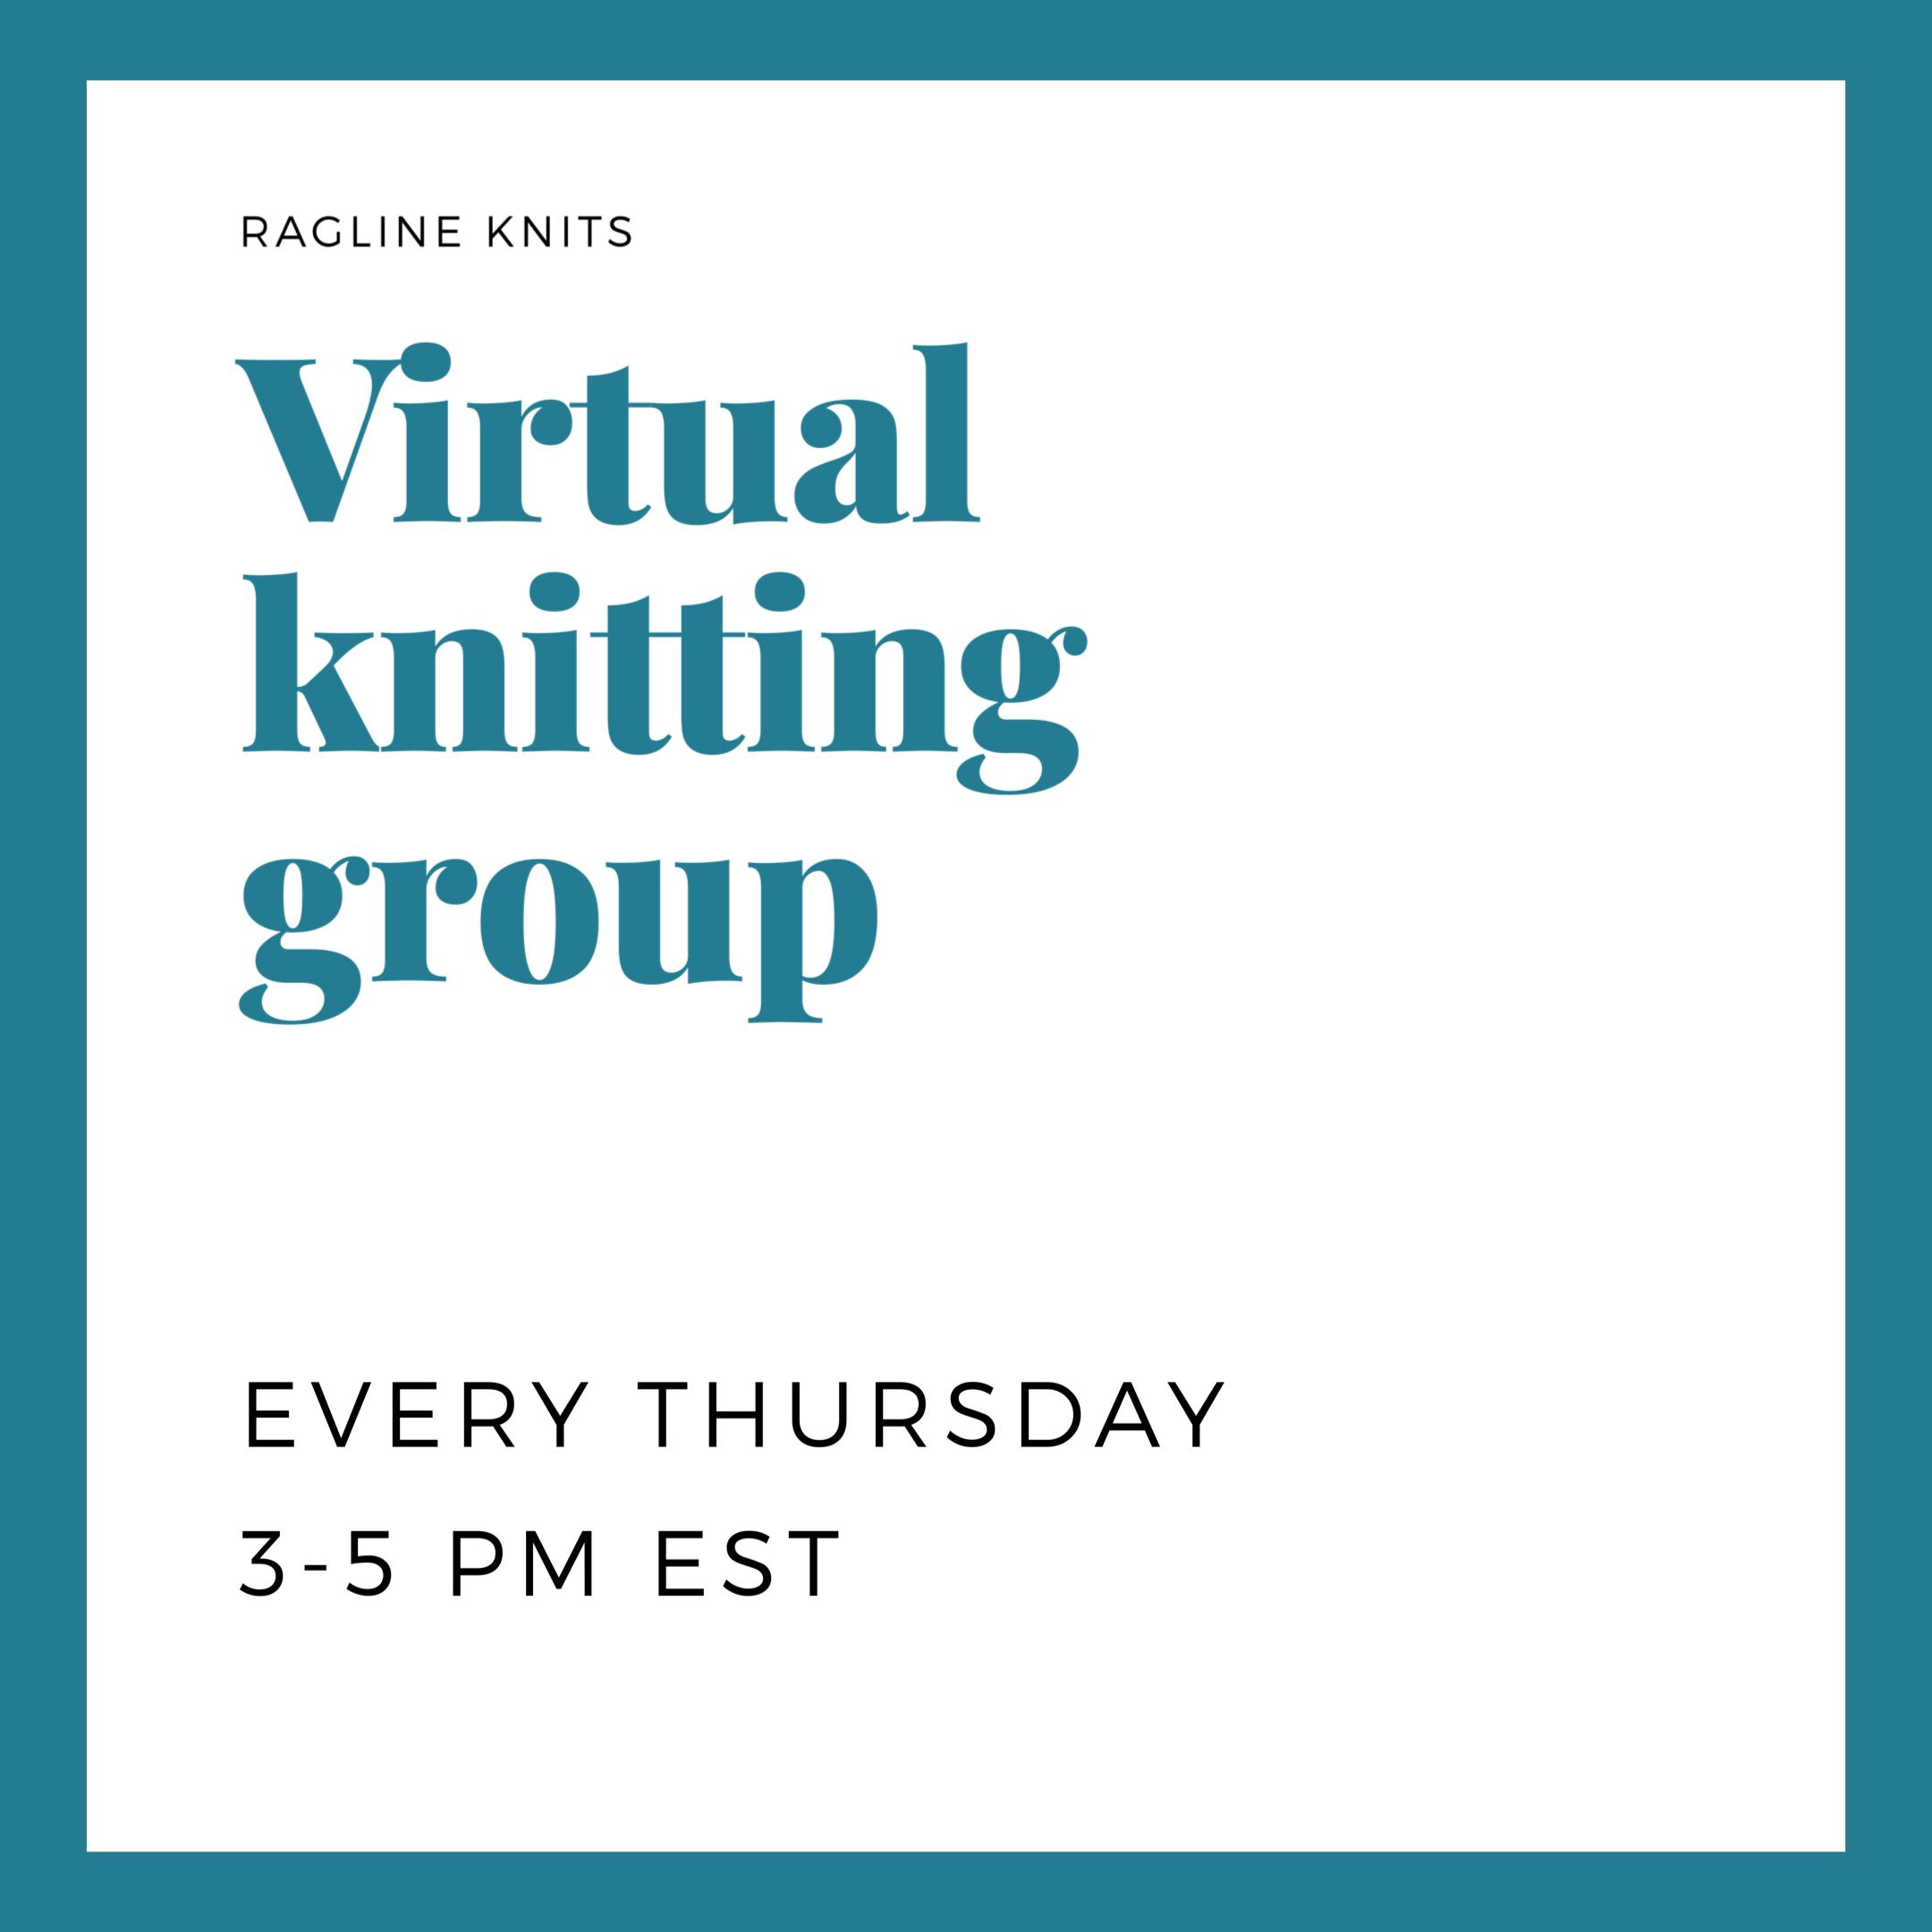 Virtual Knitting Group